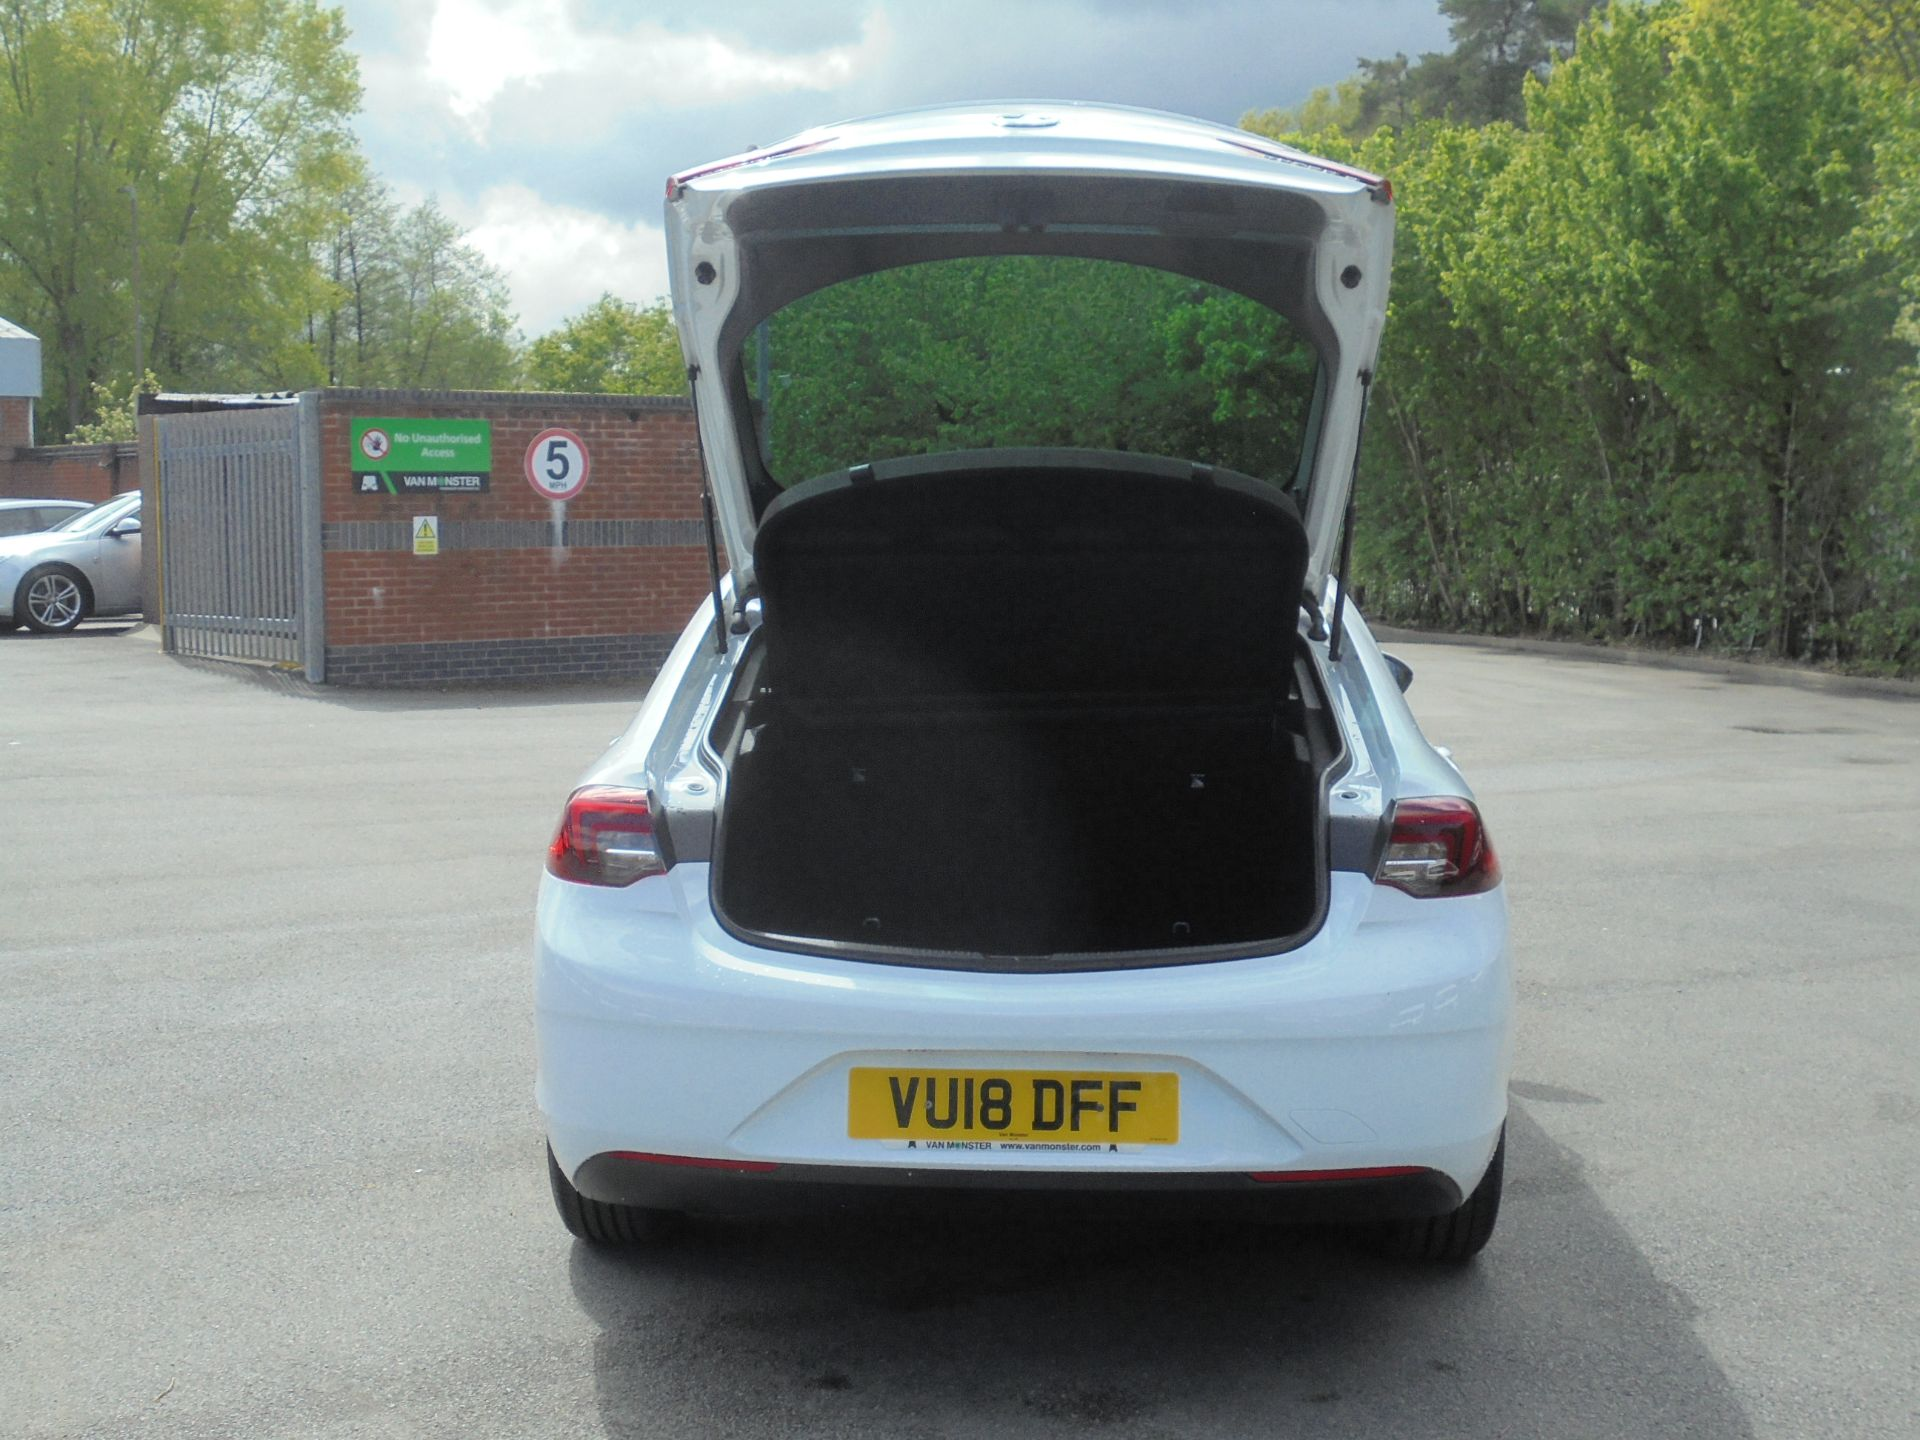 2018 Vauxhall Insignia Grand Sport 1.6 Turbo D Ecotec [136] Sri Nav 5Dr (VU18DFF) Image 8